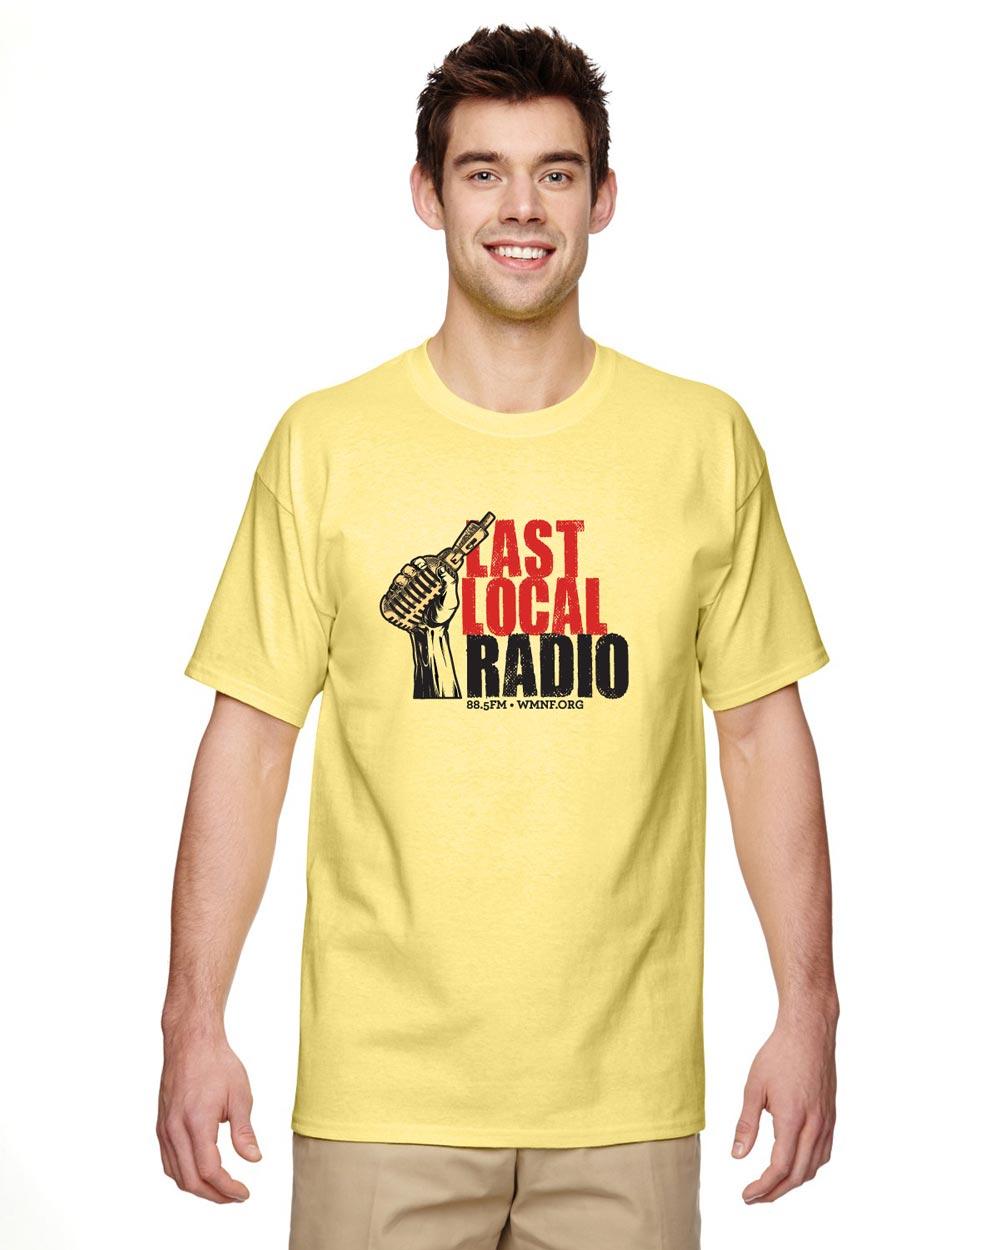 d89a4b90aa5031 WMNF Last Local Radio T-Shirt